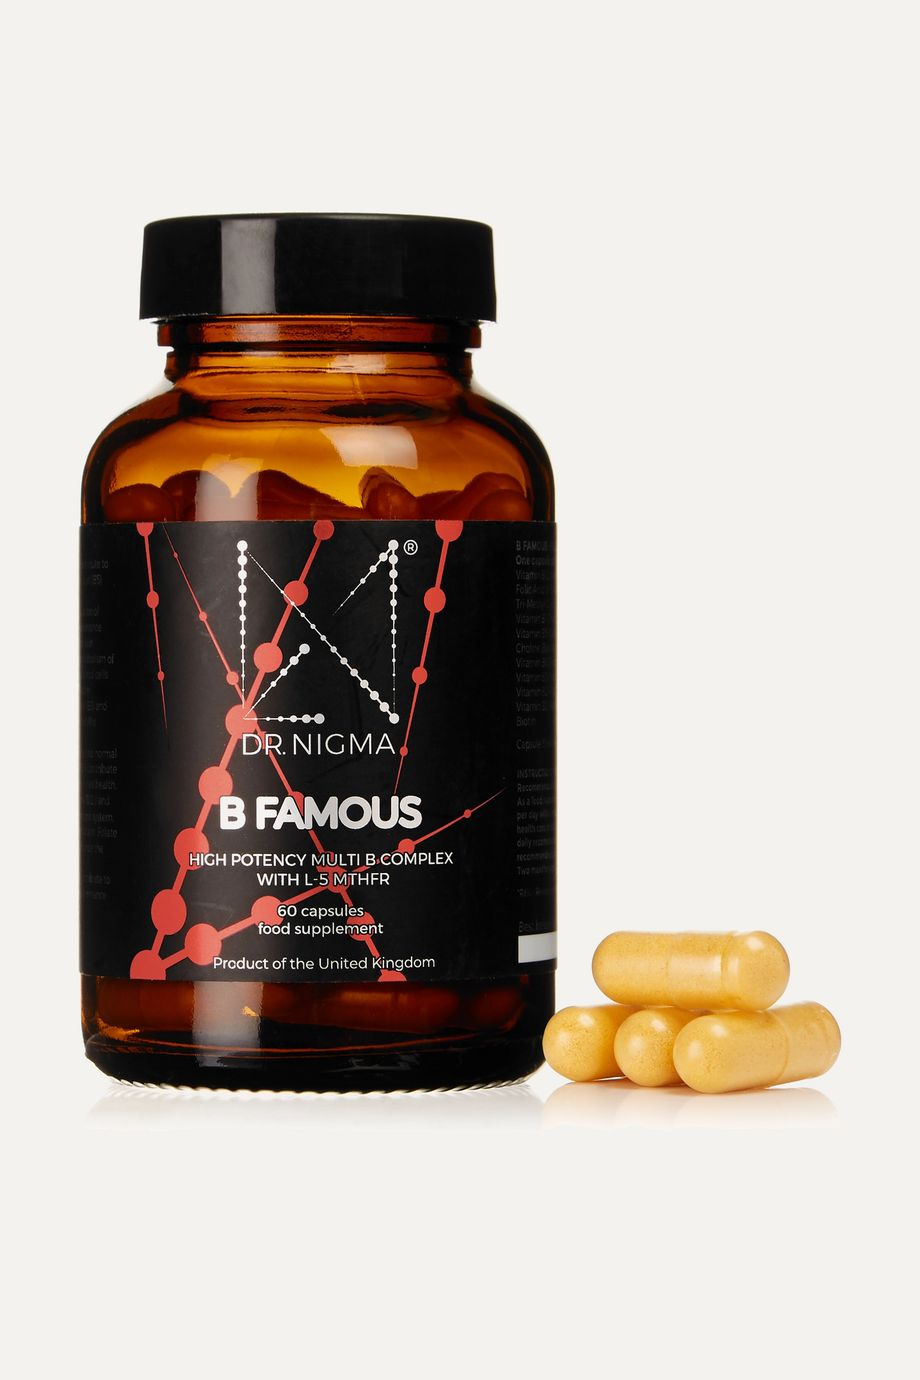 Dr. Nigma Talib B Famous (60 capsules)